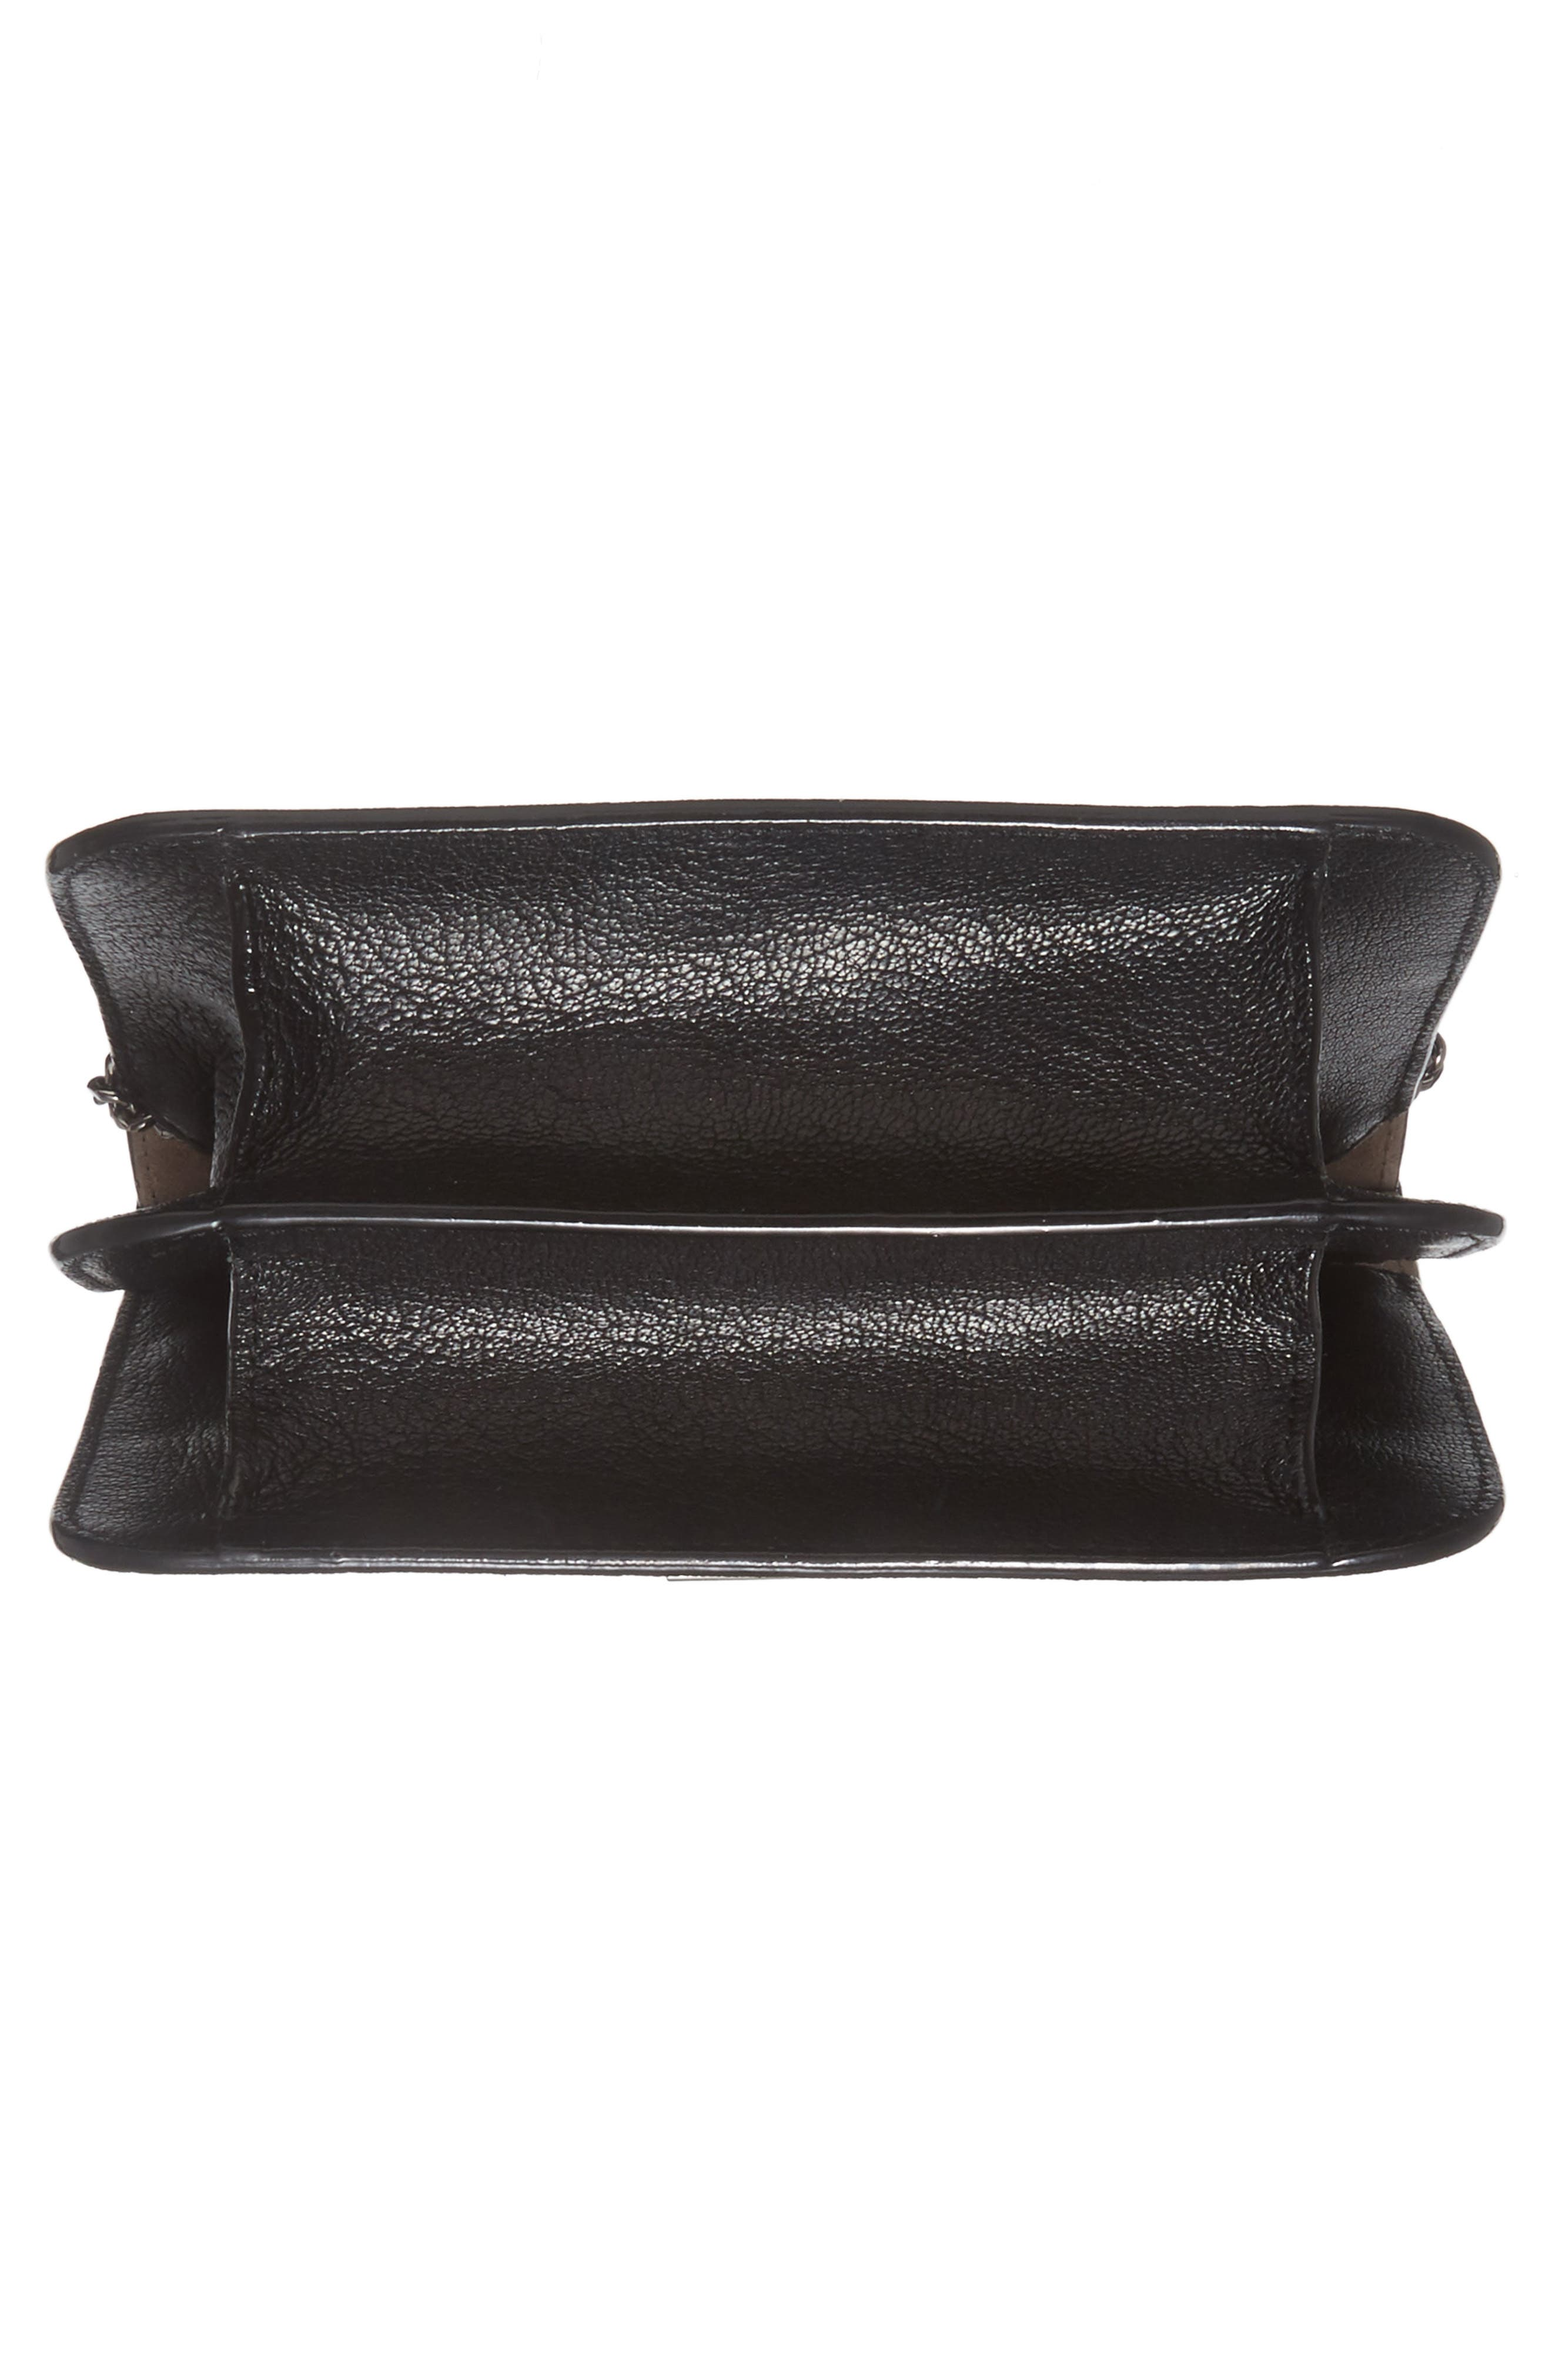 Rebel Leather Crossbody Bag,                             Alternate thumbnail 6, color,                             BLACK/ GUNMETAL